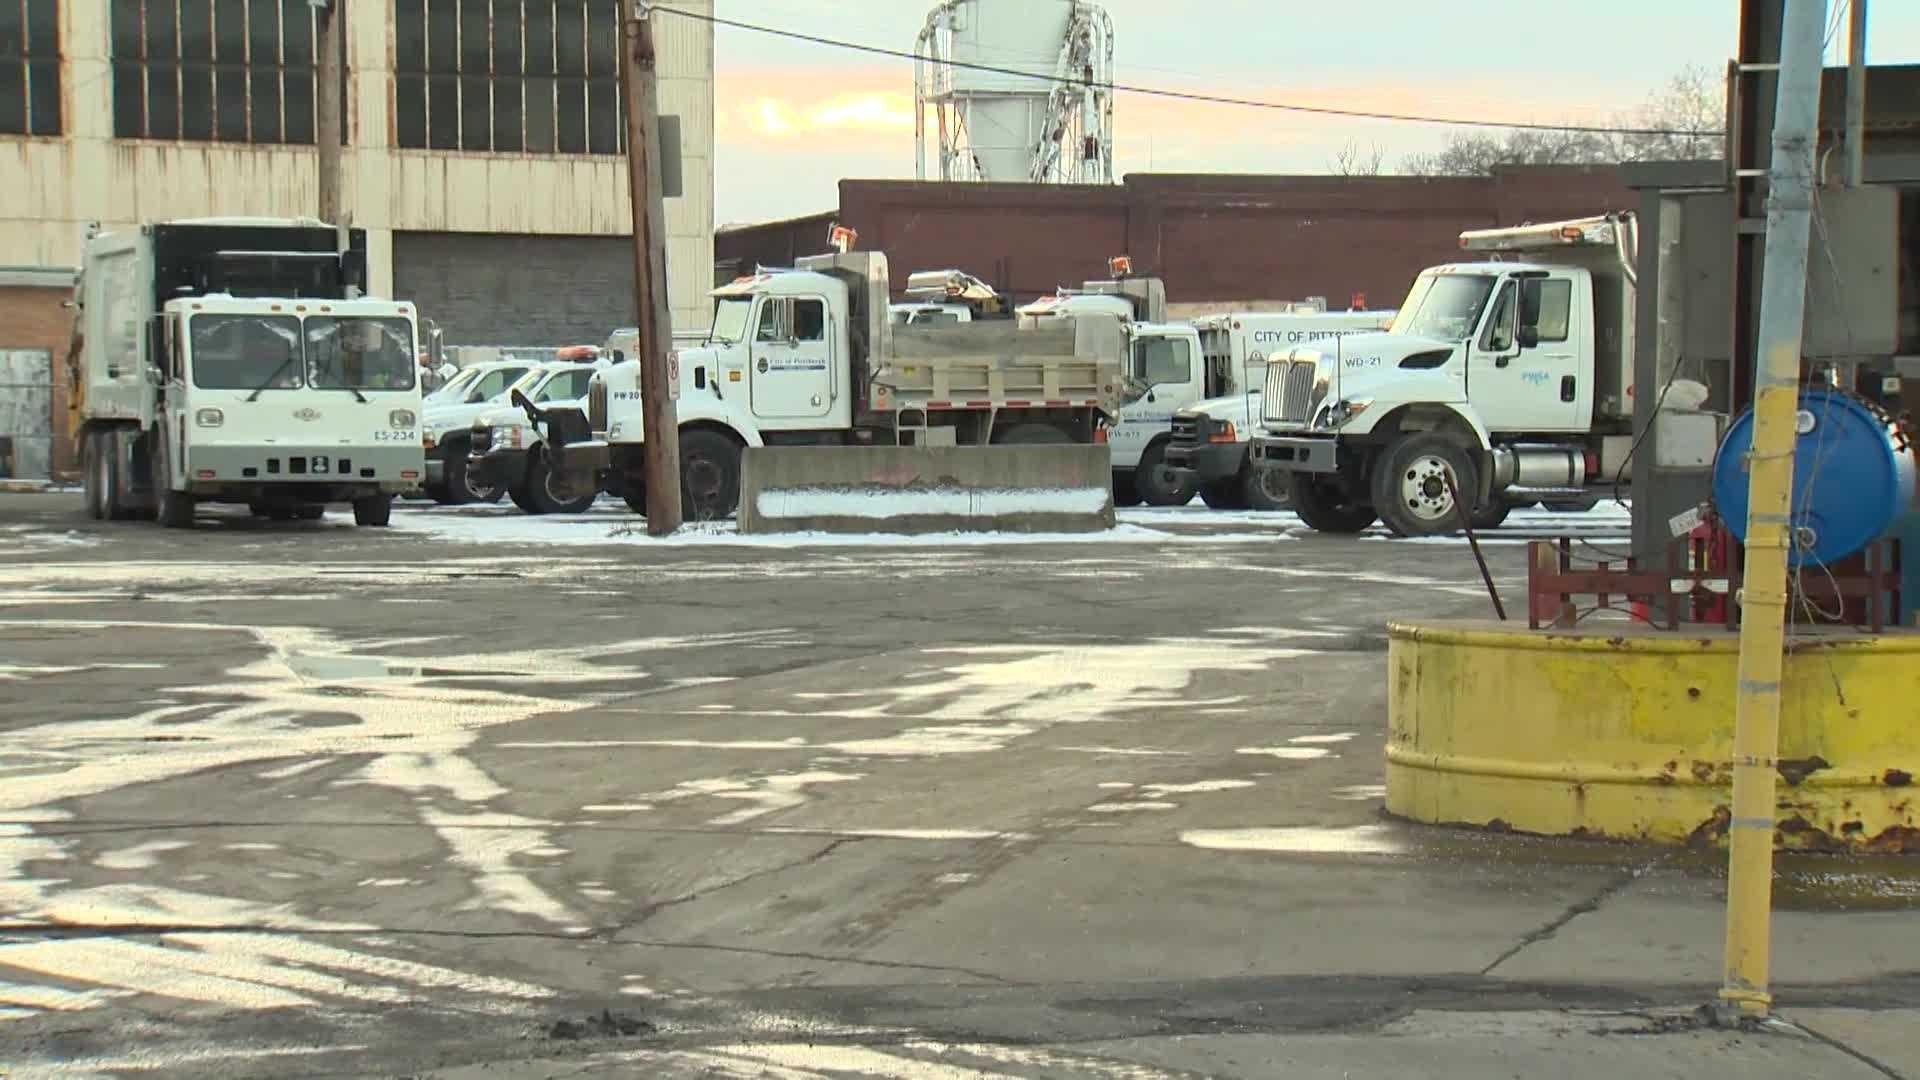 img-city of Pittsburgh snow trucks